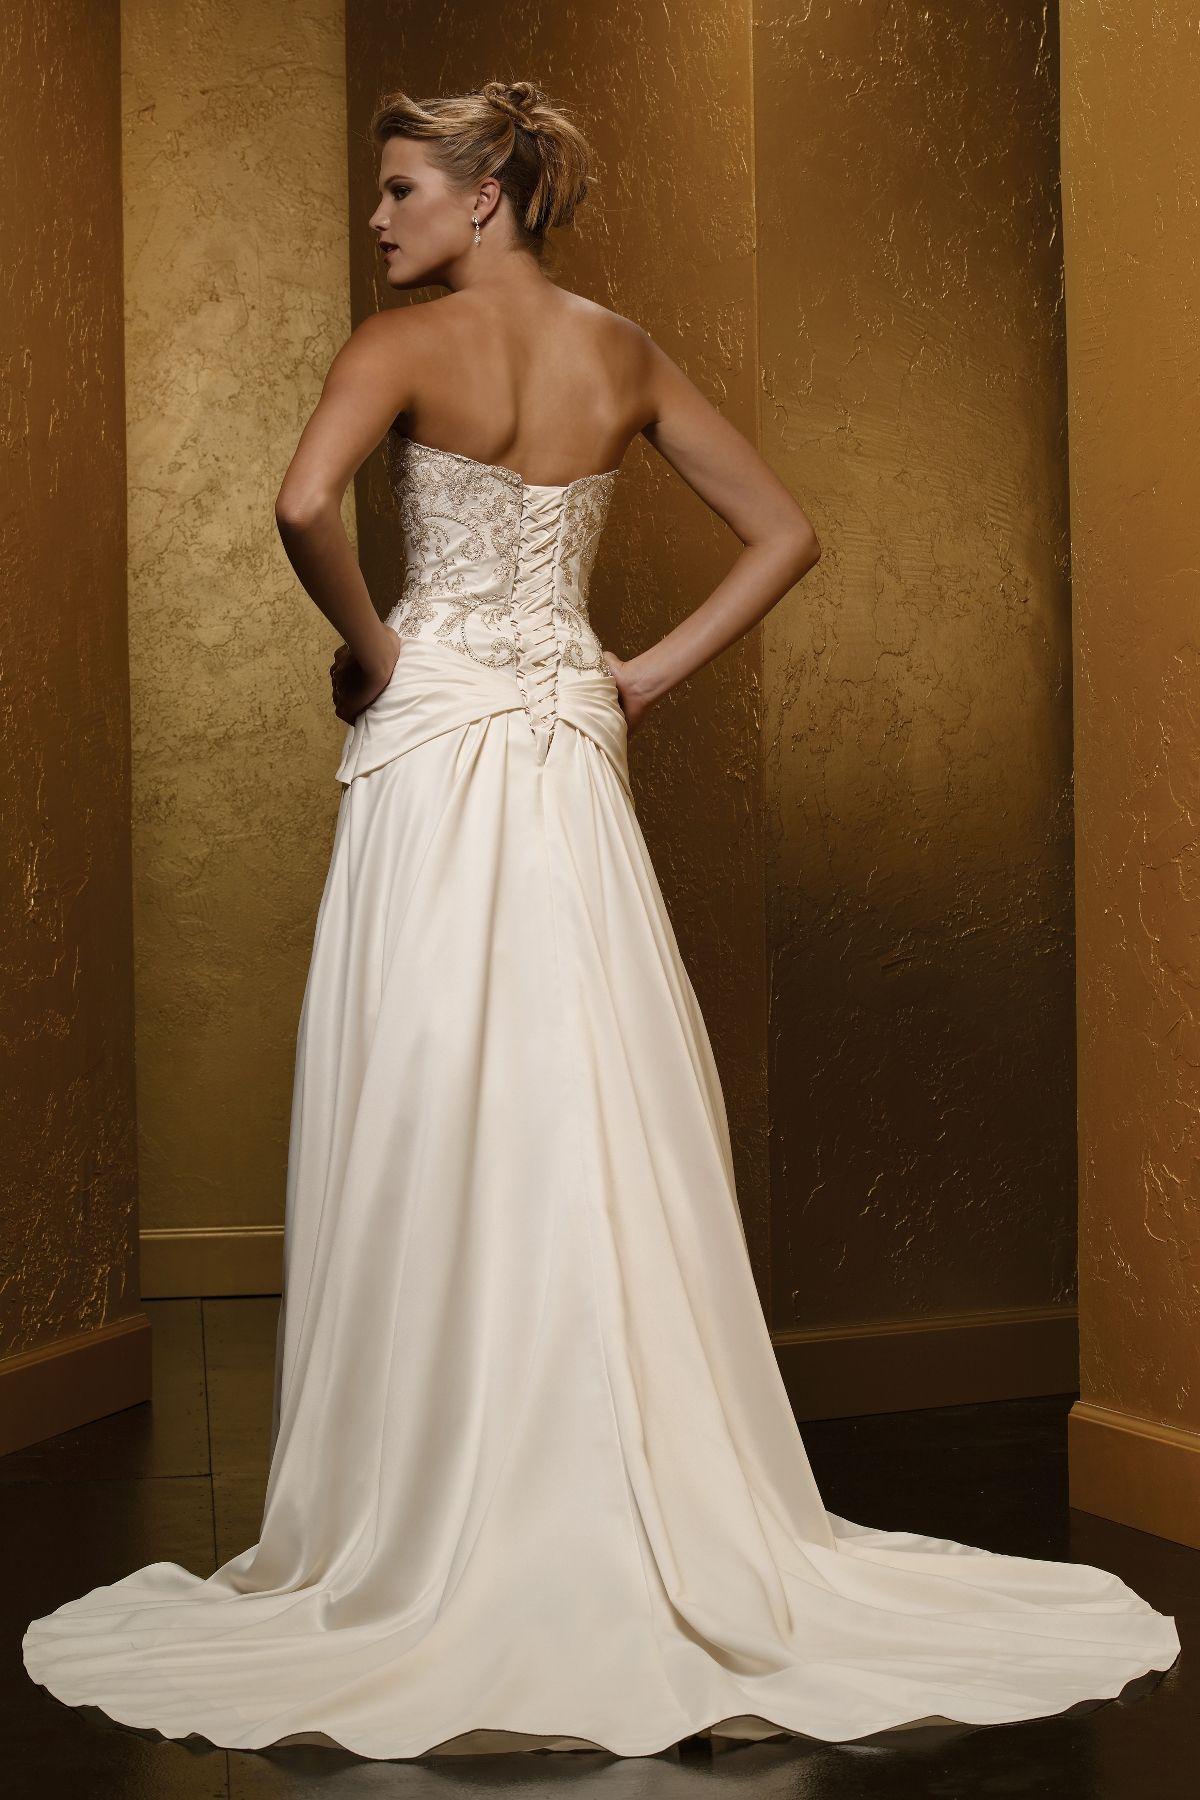 M487C - Satin A-line wedding dress with slight sweetheart neckline ...